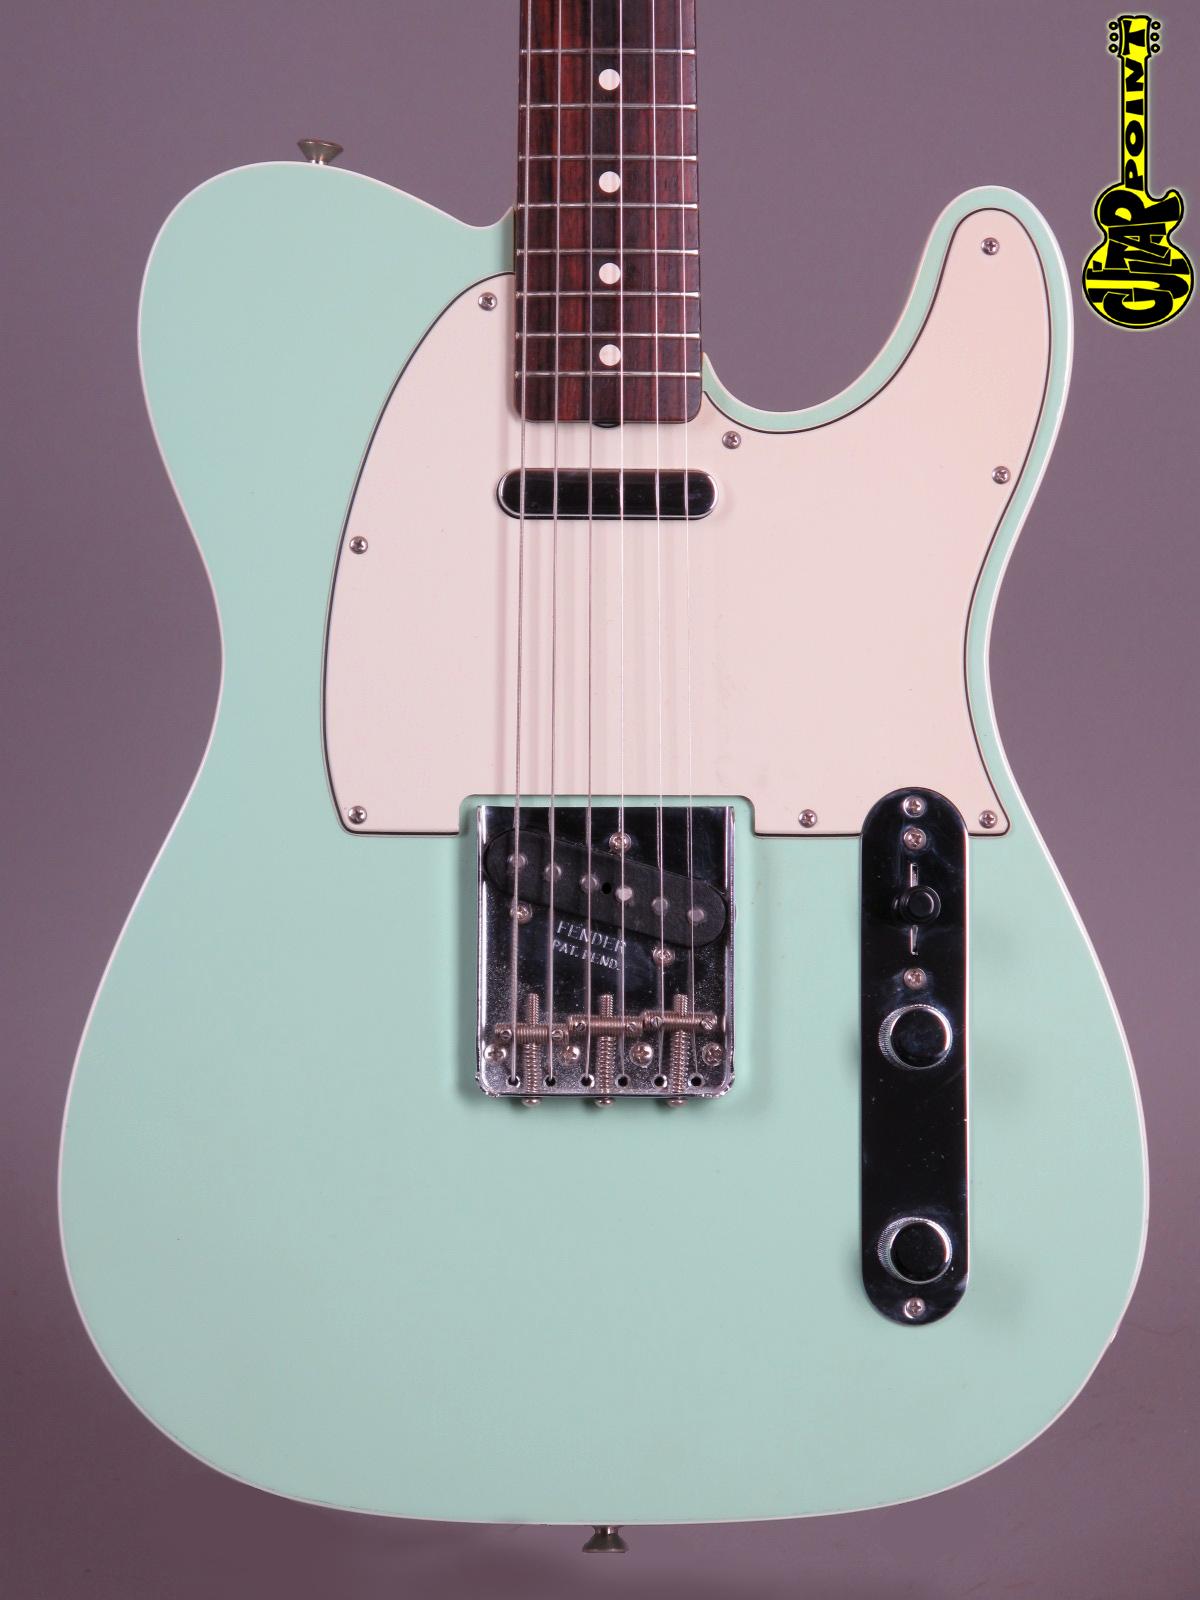 2009 Fender American Vintage 62 Telecaster Custom Surf Green